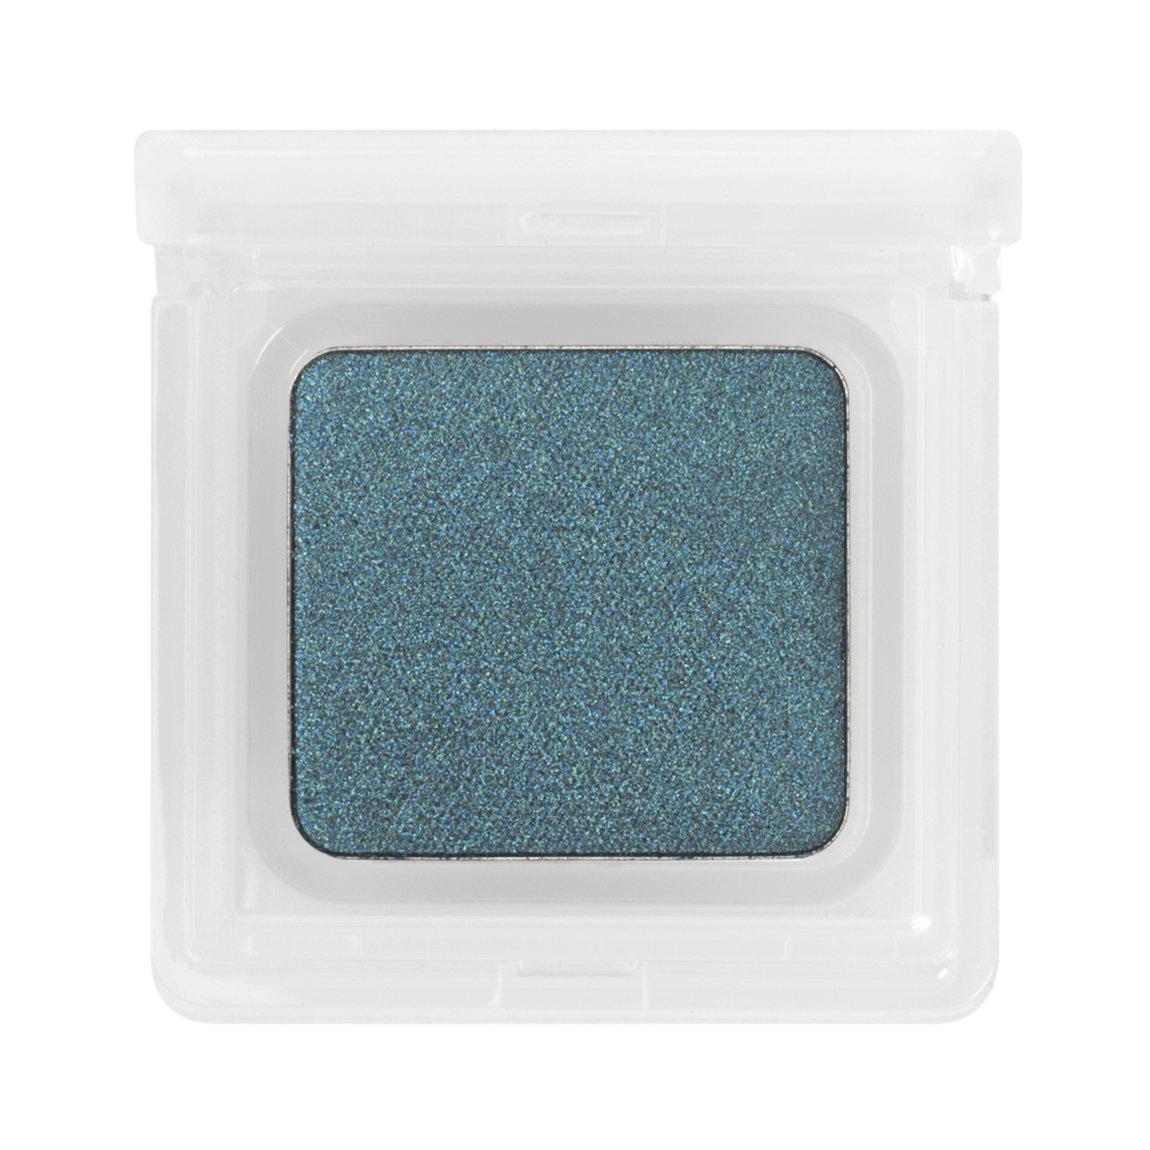 Natasha Denona Mono Eyeshadow Calypso Blue 05W